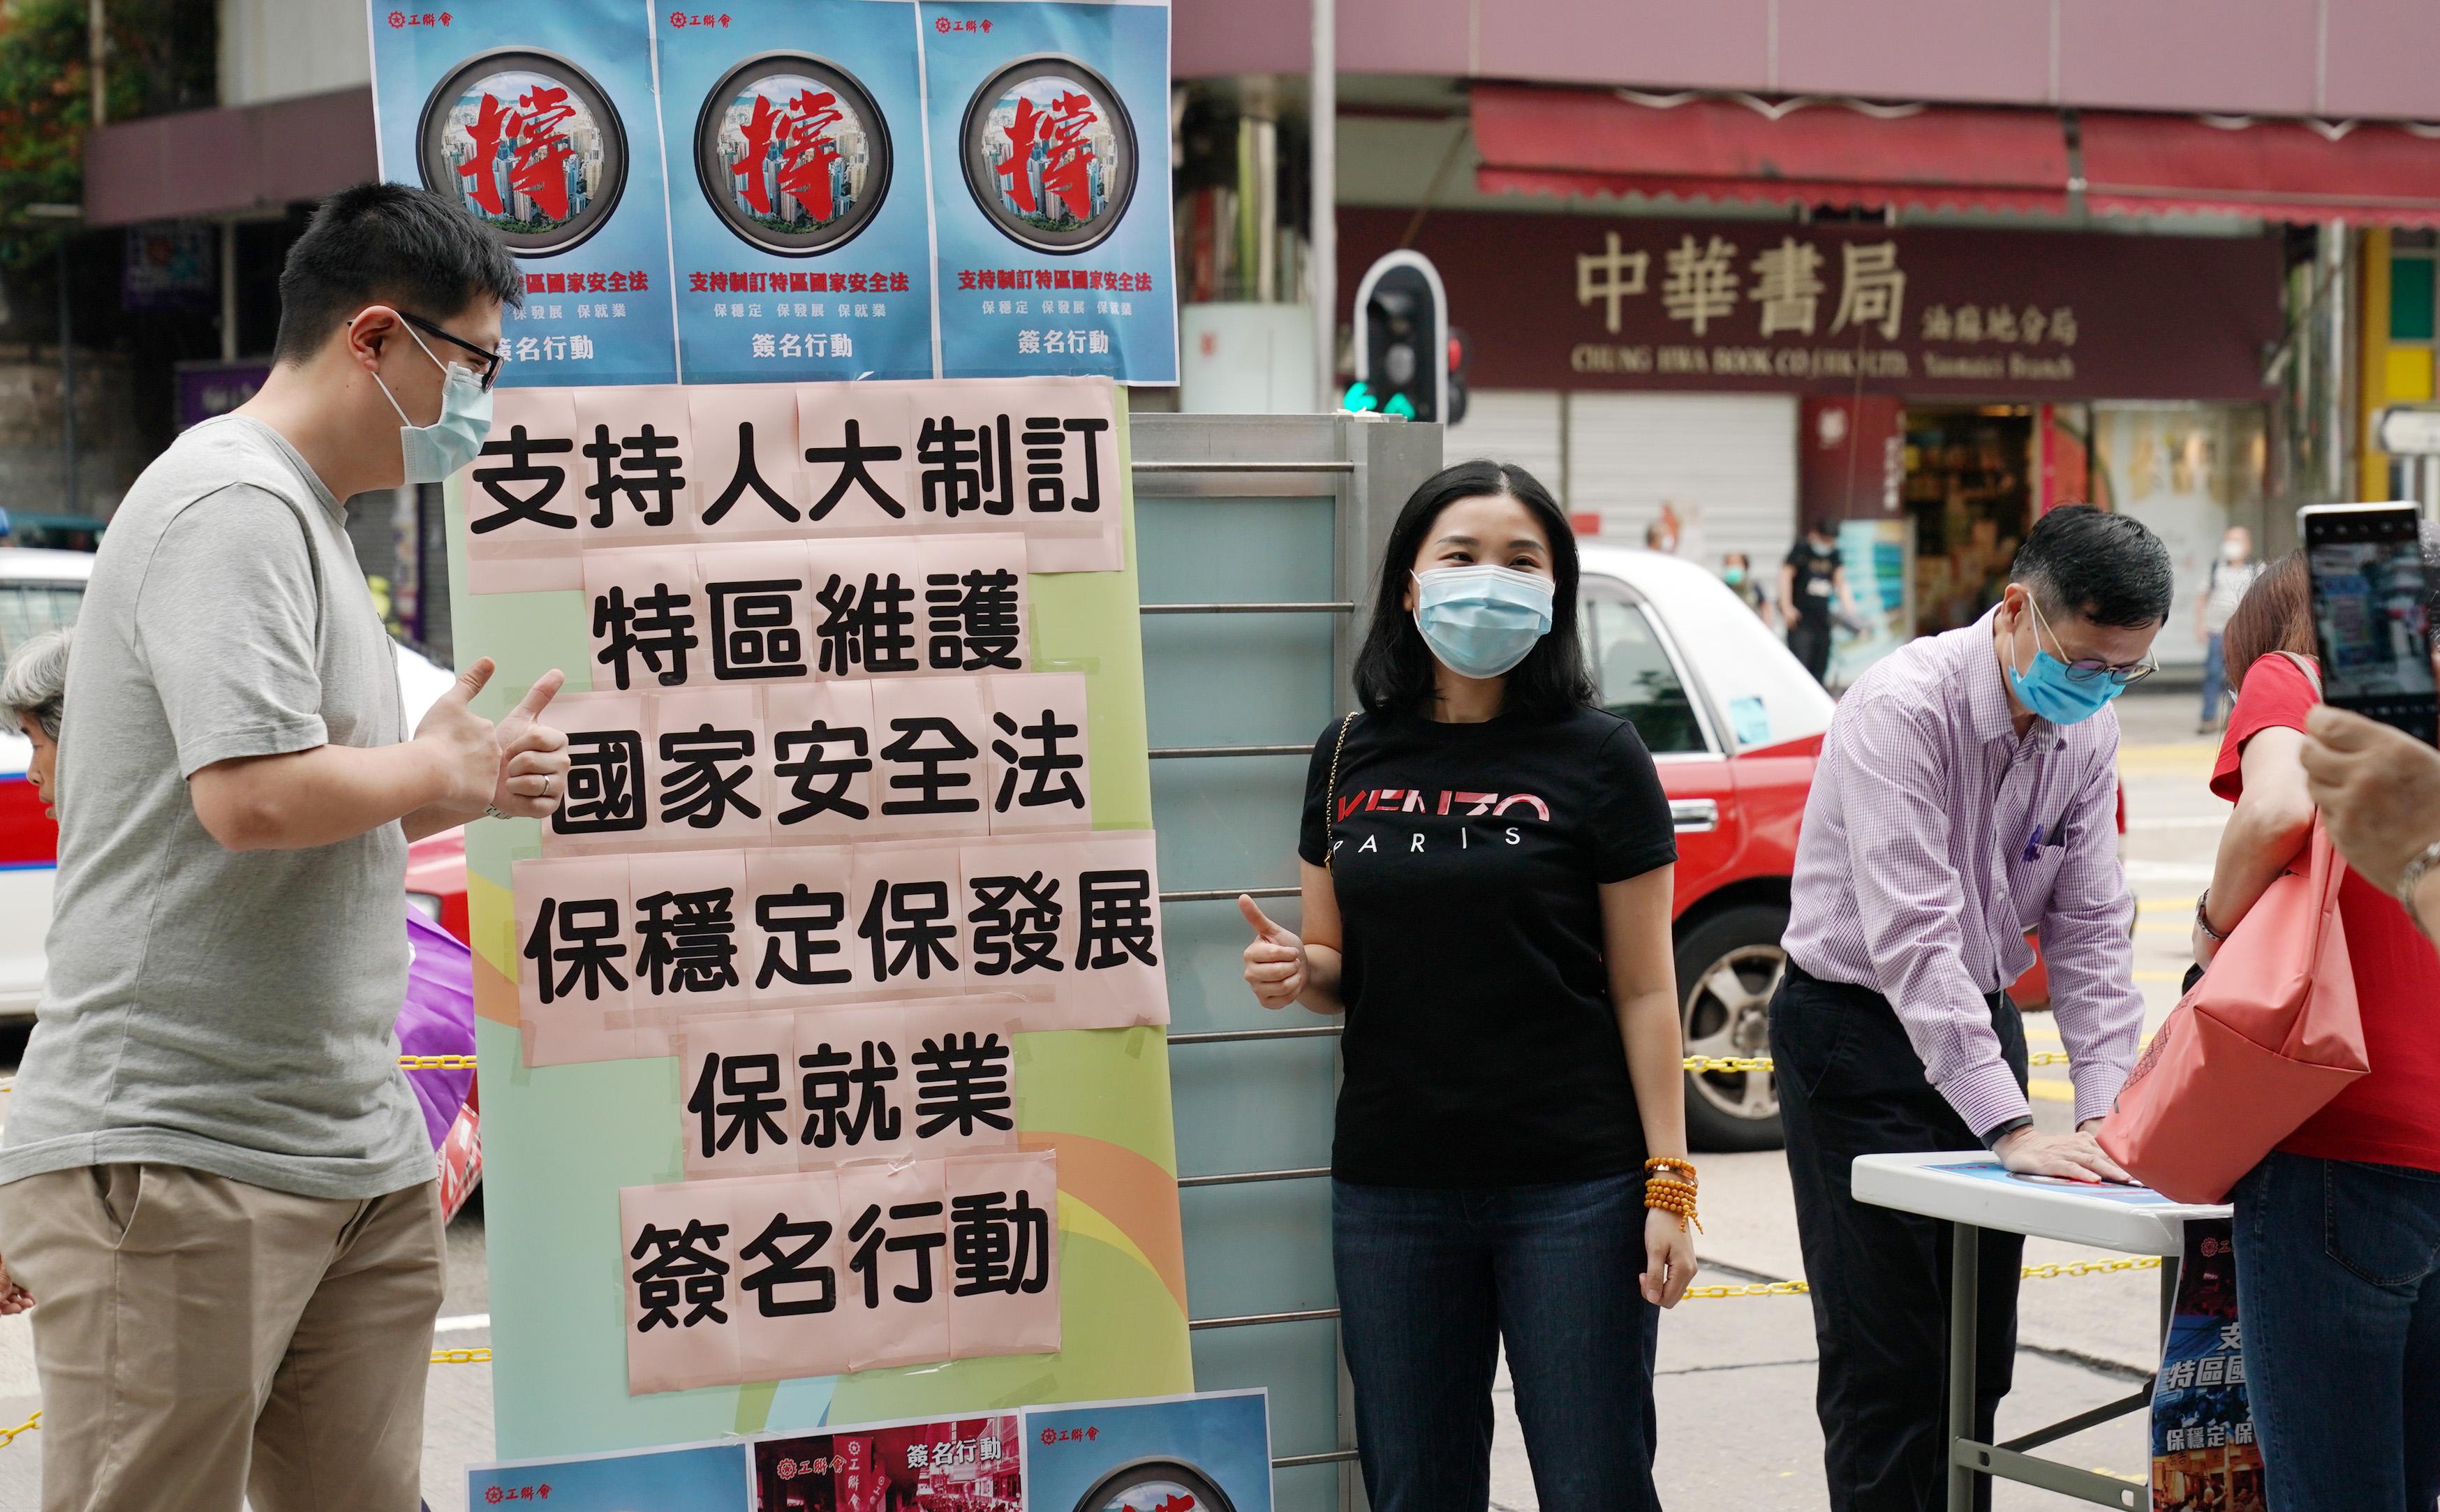 Commentary: China's national security, Hong Kong affairs brook no external interference - Xinhua | English.news.cn